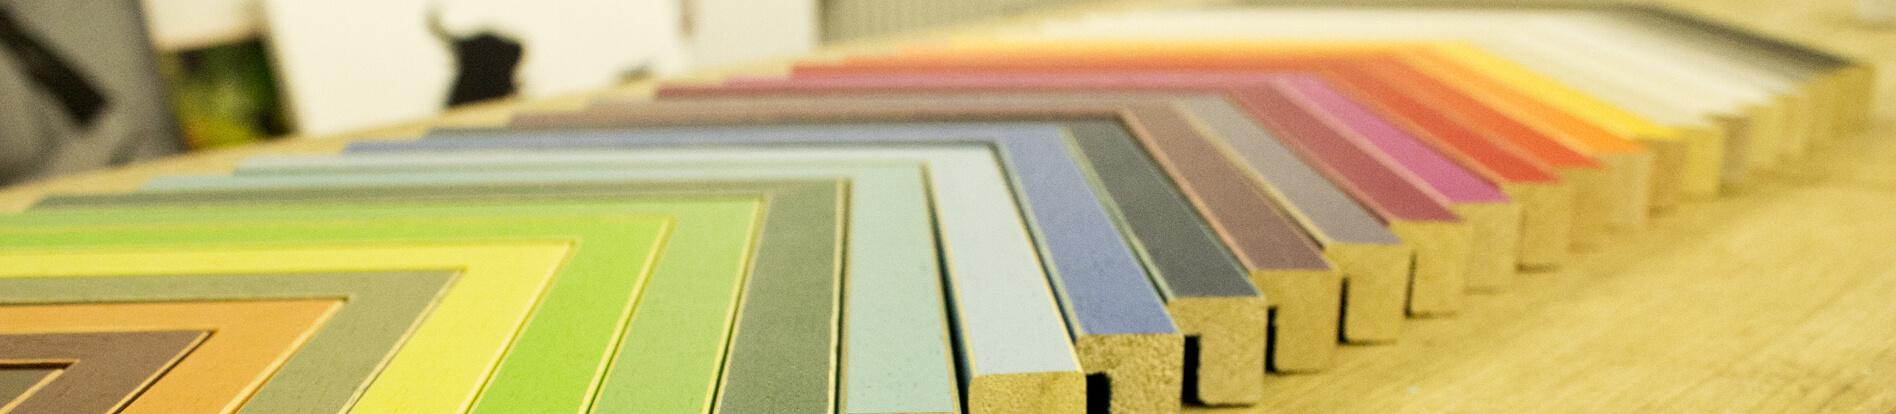 Bilderrahmen in verschiedenen Farben